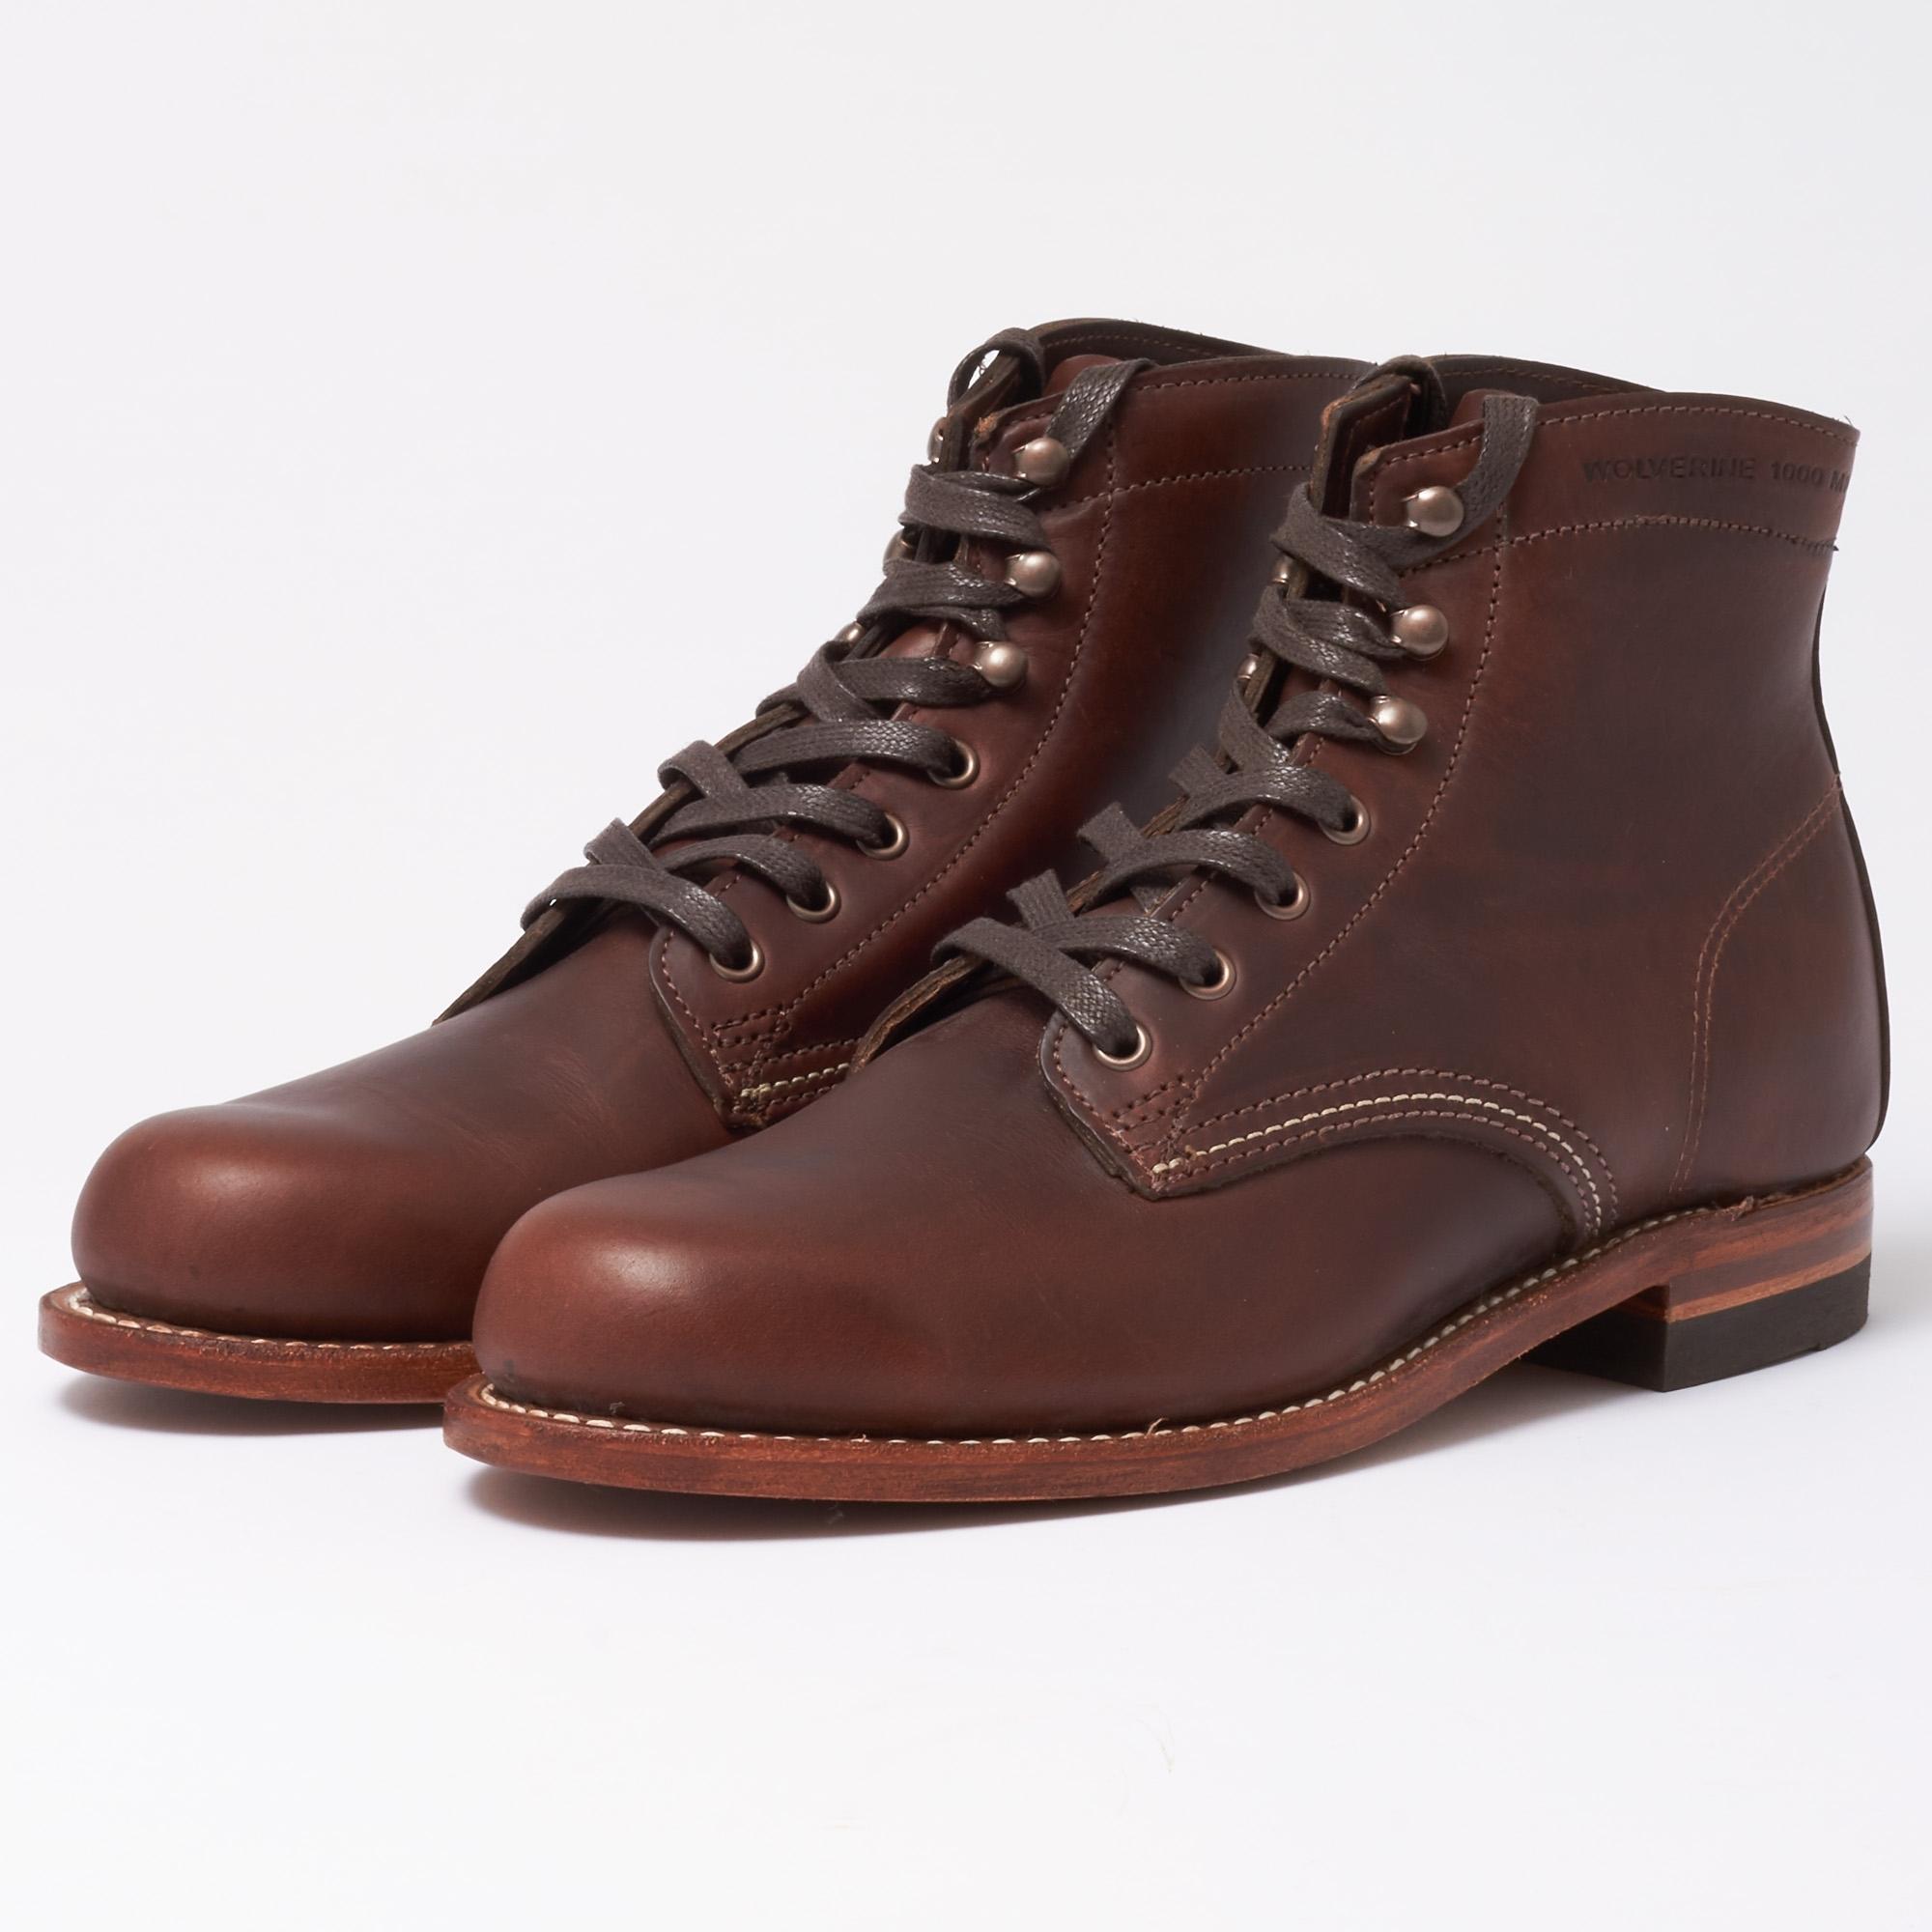 6ecce8d91f4 Men's Original 1000 Mile Brown Boots